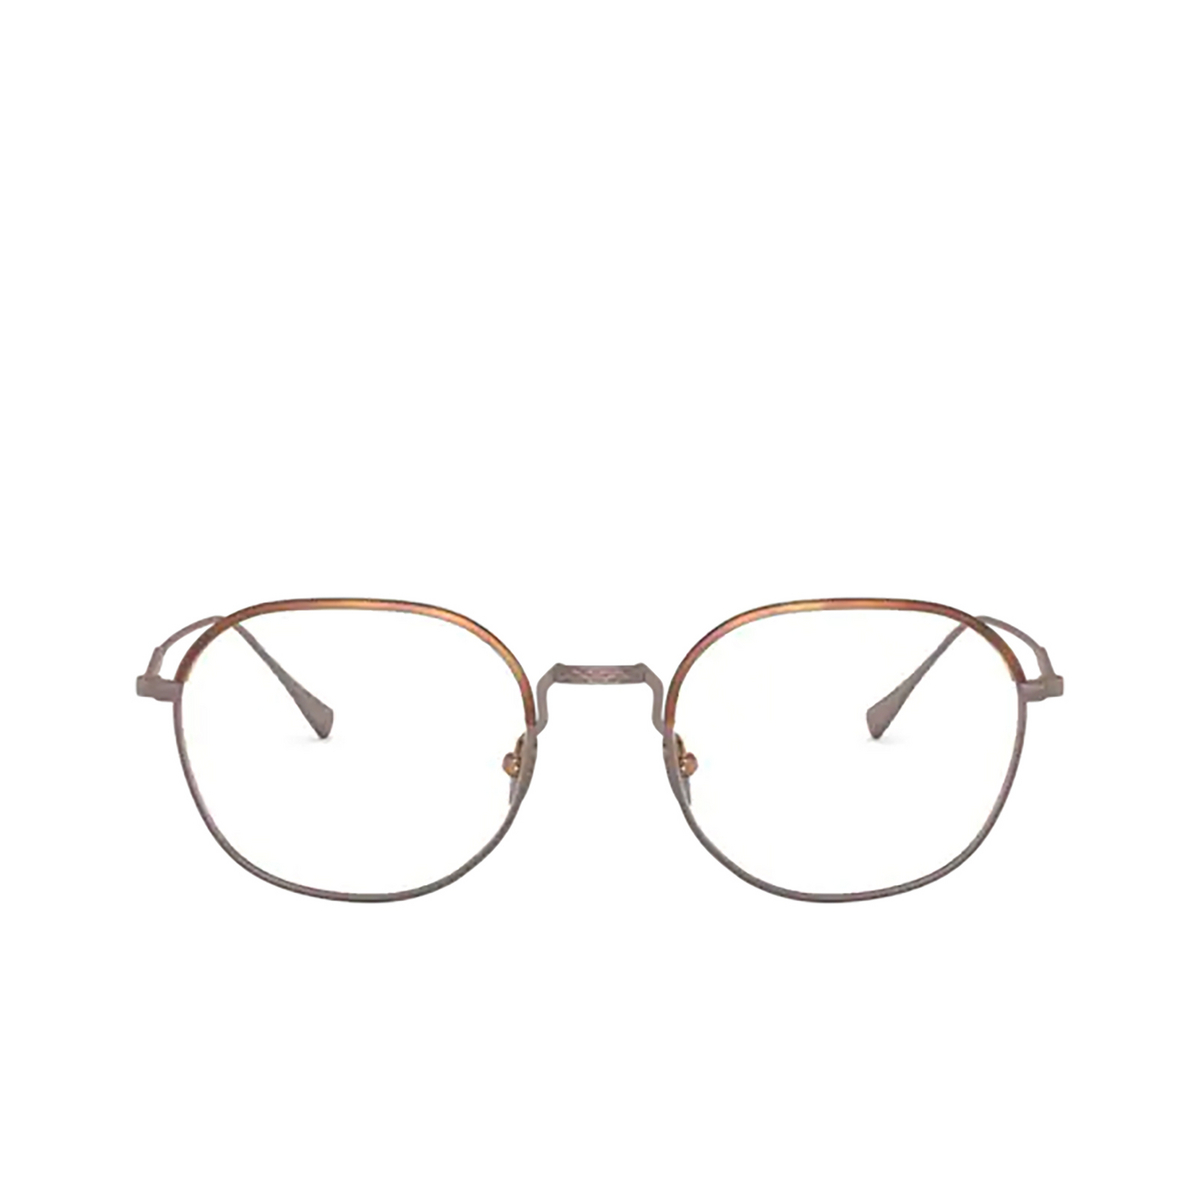 Giorgio Armani® Round Eyeglasses: AR5103J color Matte Honey Havana&bronze 3006 - front view.